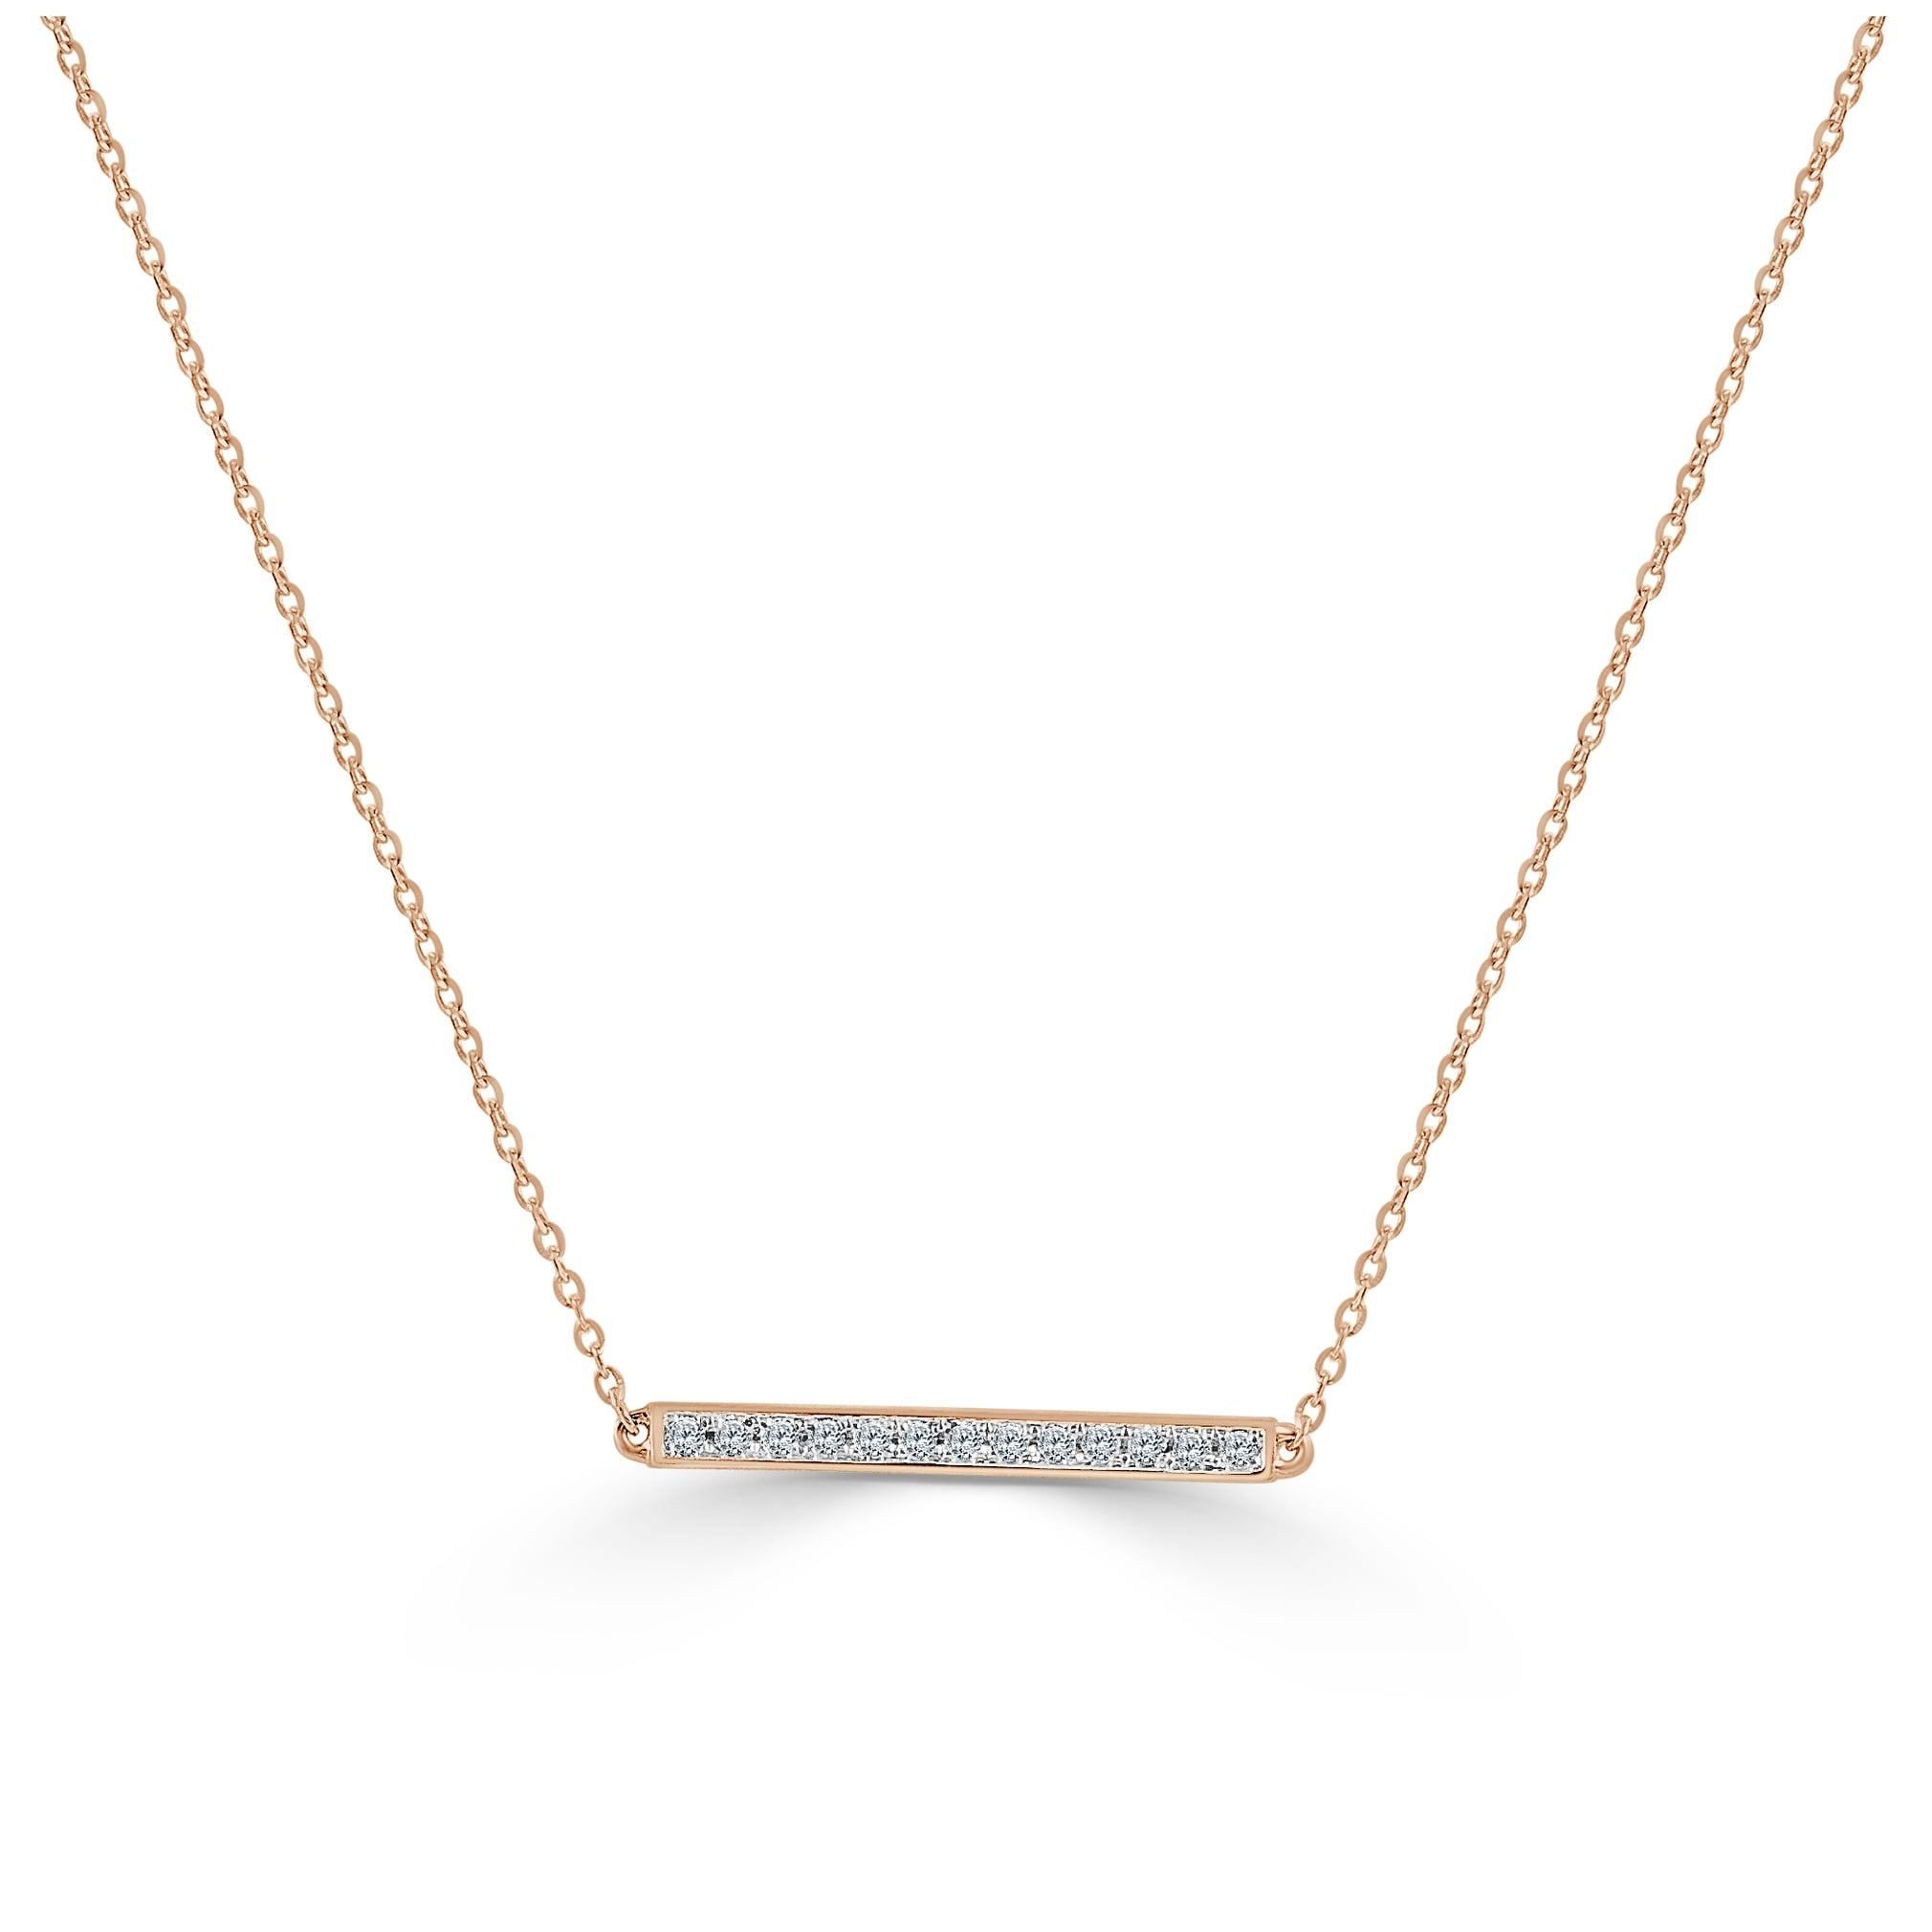 10 carat diamond 14k white gold chain bar necklace gift for Christmas birthday Diamond bar necklace 14k gold handmade design genuine